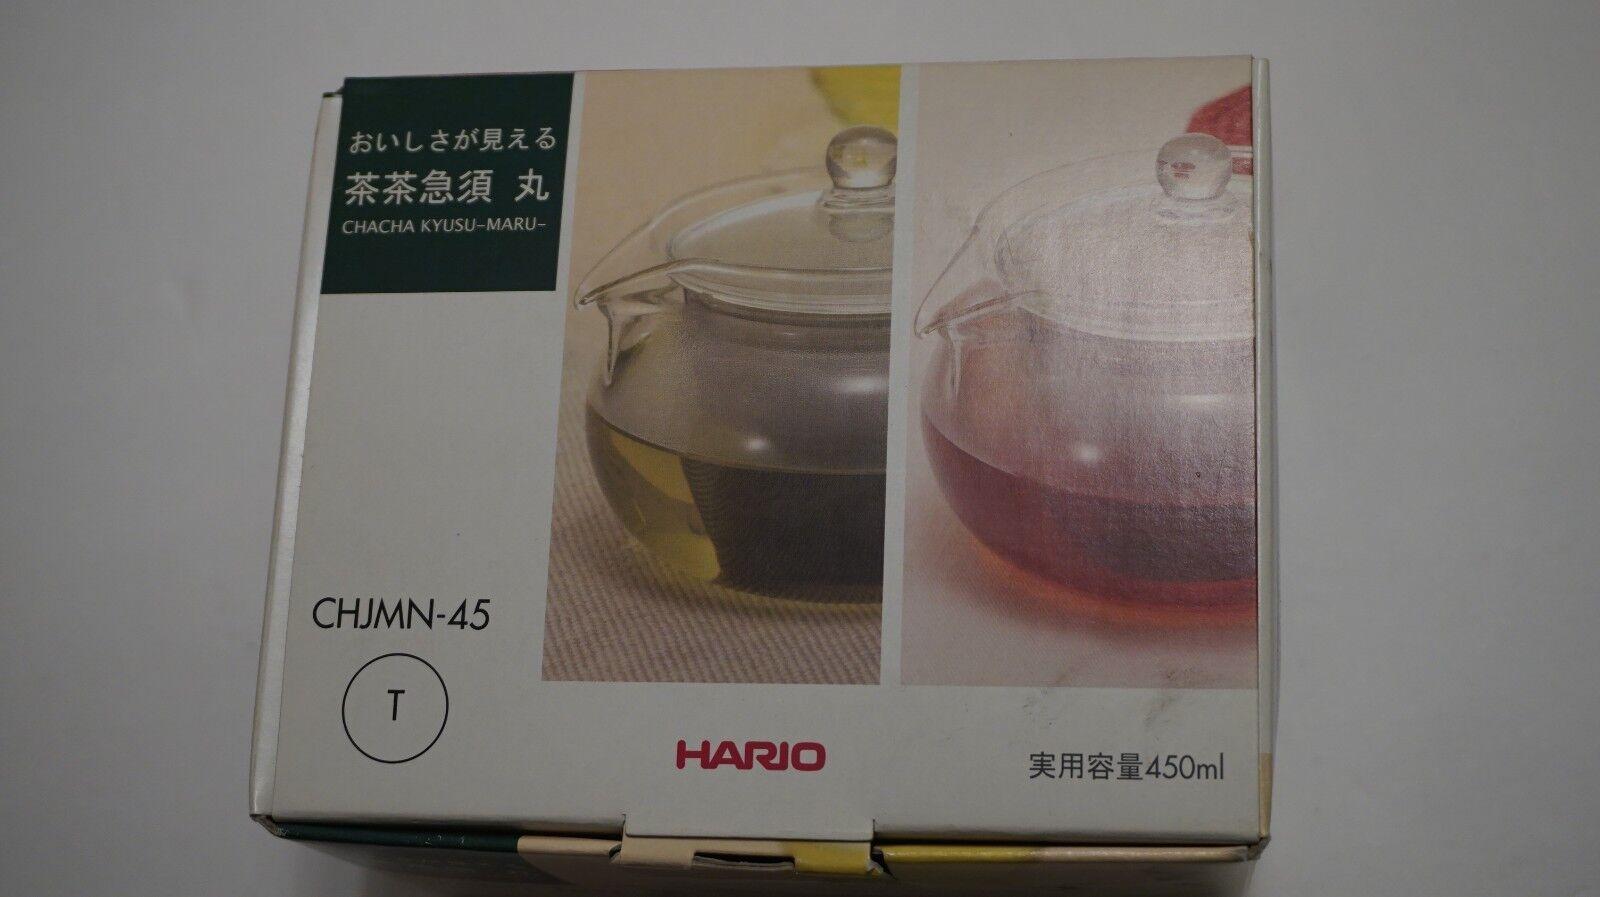 Hario Green Tea All Glass Tea Pot Japanese Cha Cha Kyusu Mar